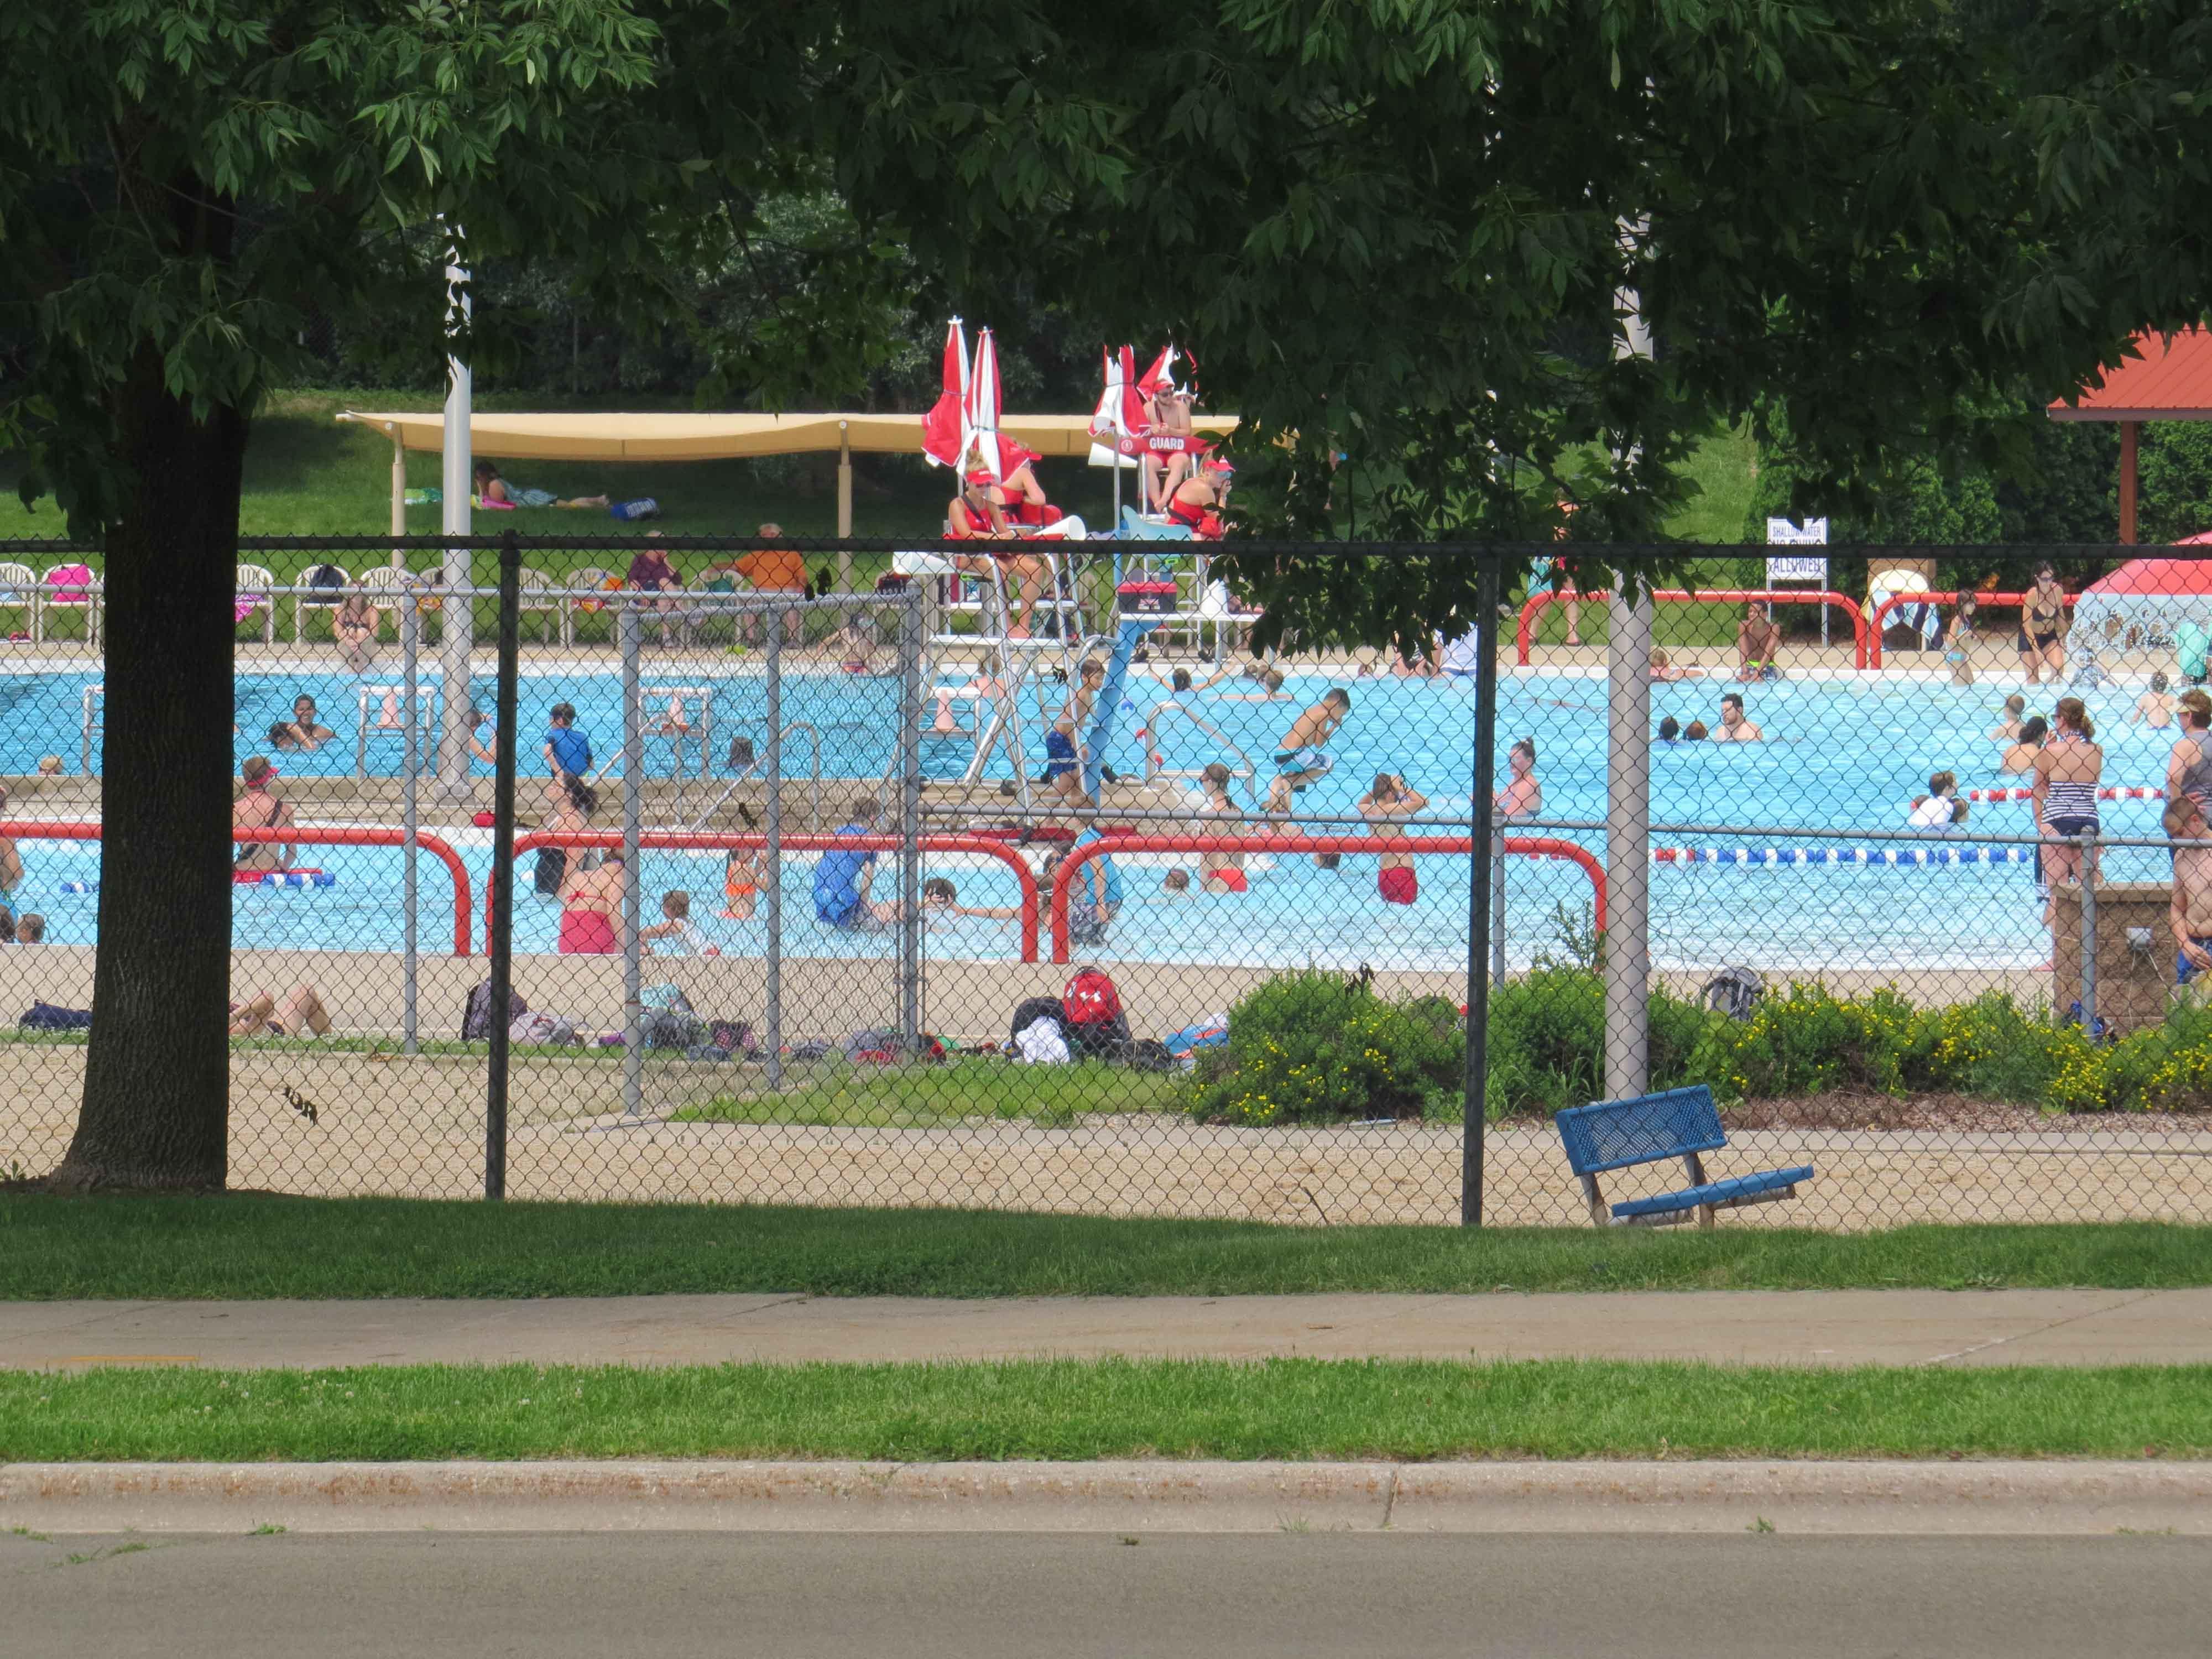 Sheehan Park Master Plan: Family Aquatic Center